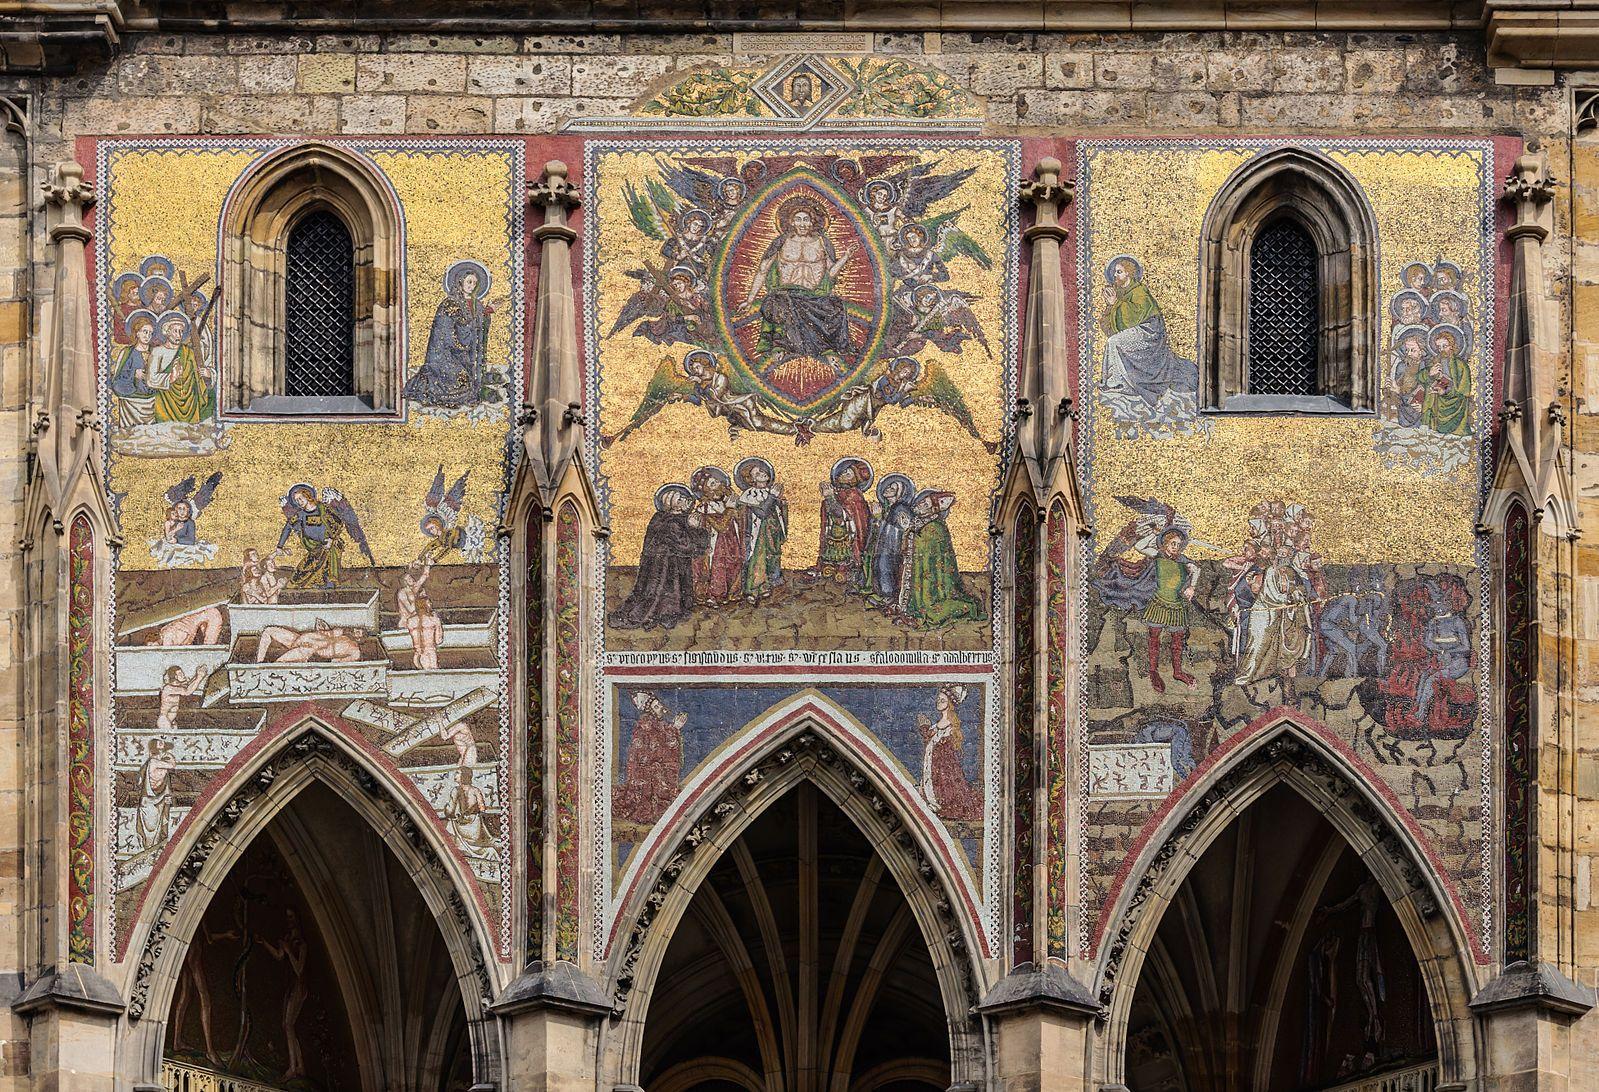 The Last Judgment mosaic, 14th-century, south facade of Saint Vitus Cathedral, Prague, Czech Republic.